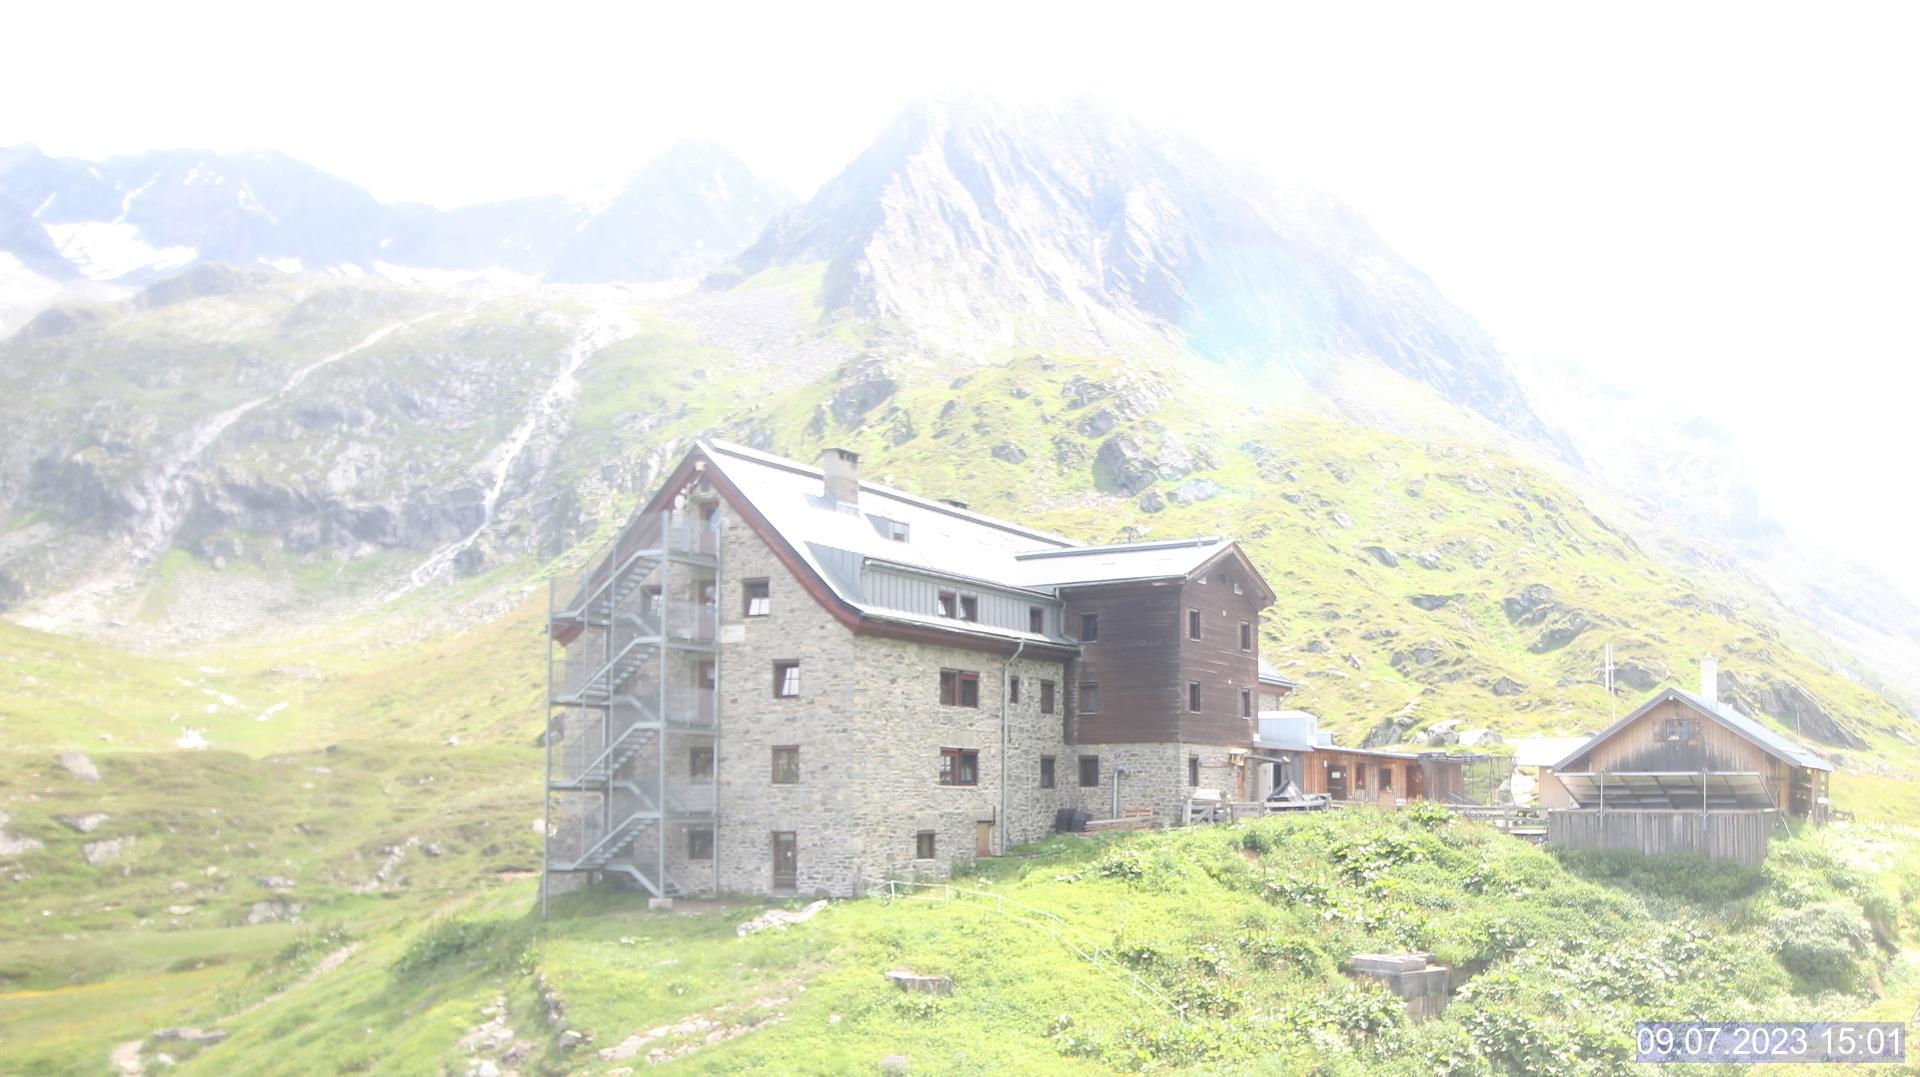 WEBkamera Franz Senn Hütte